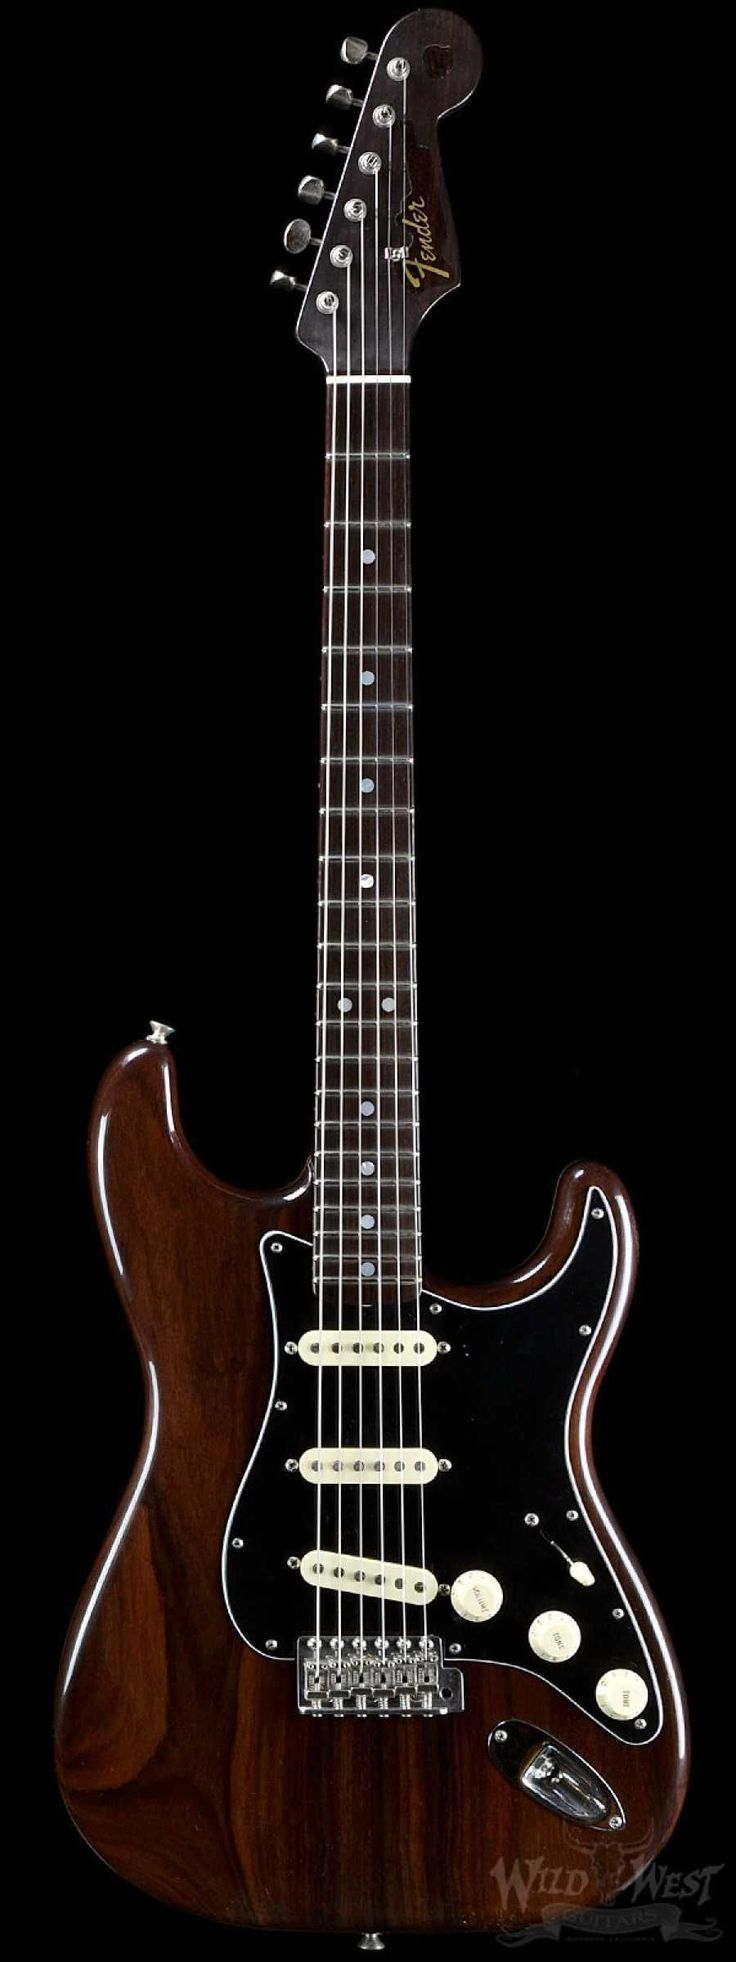 Fender Custom Shop 1960′s Closet Classic Rosewood Stratocaster - Wild West Guitars https://wildwestguitars.com/electric/fender-custom-shop-1960s-closet-classic-rosewood-stratocaster